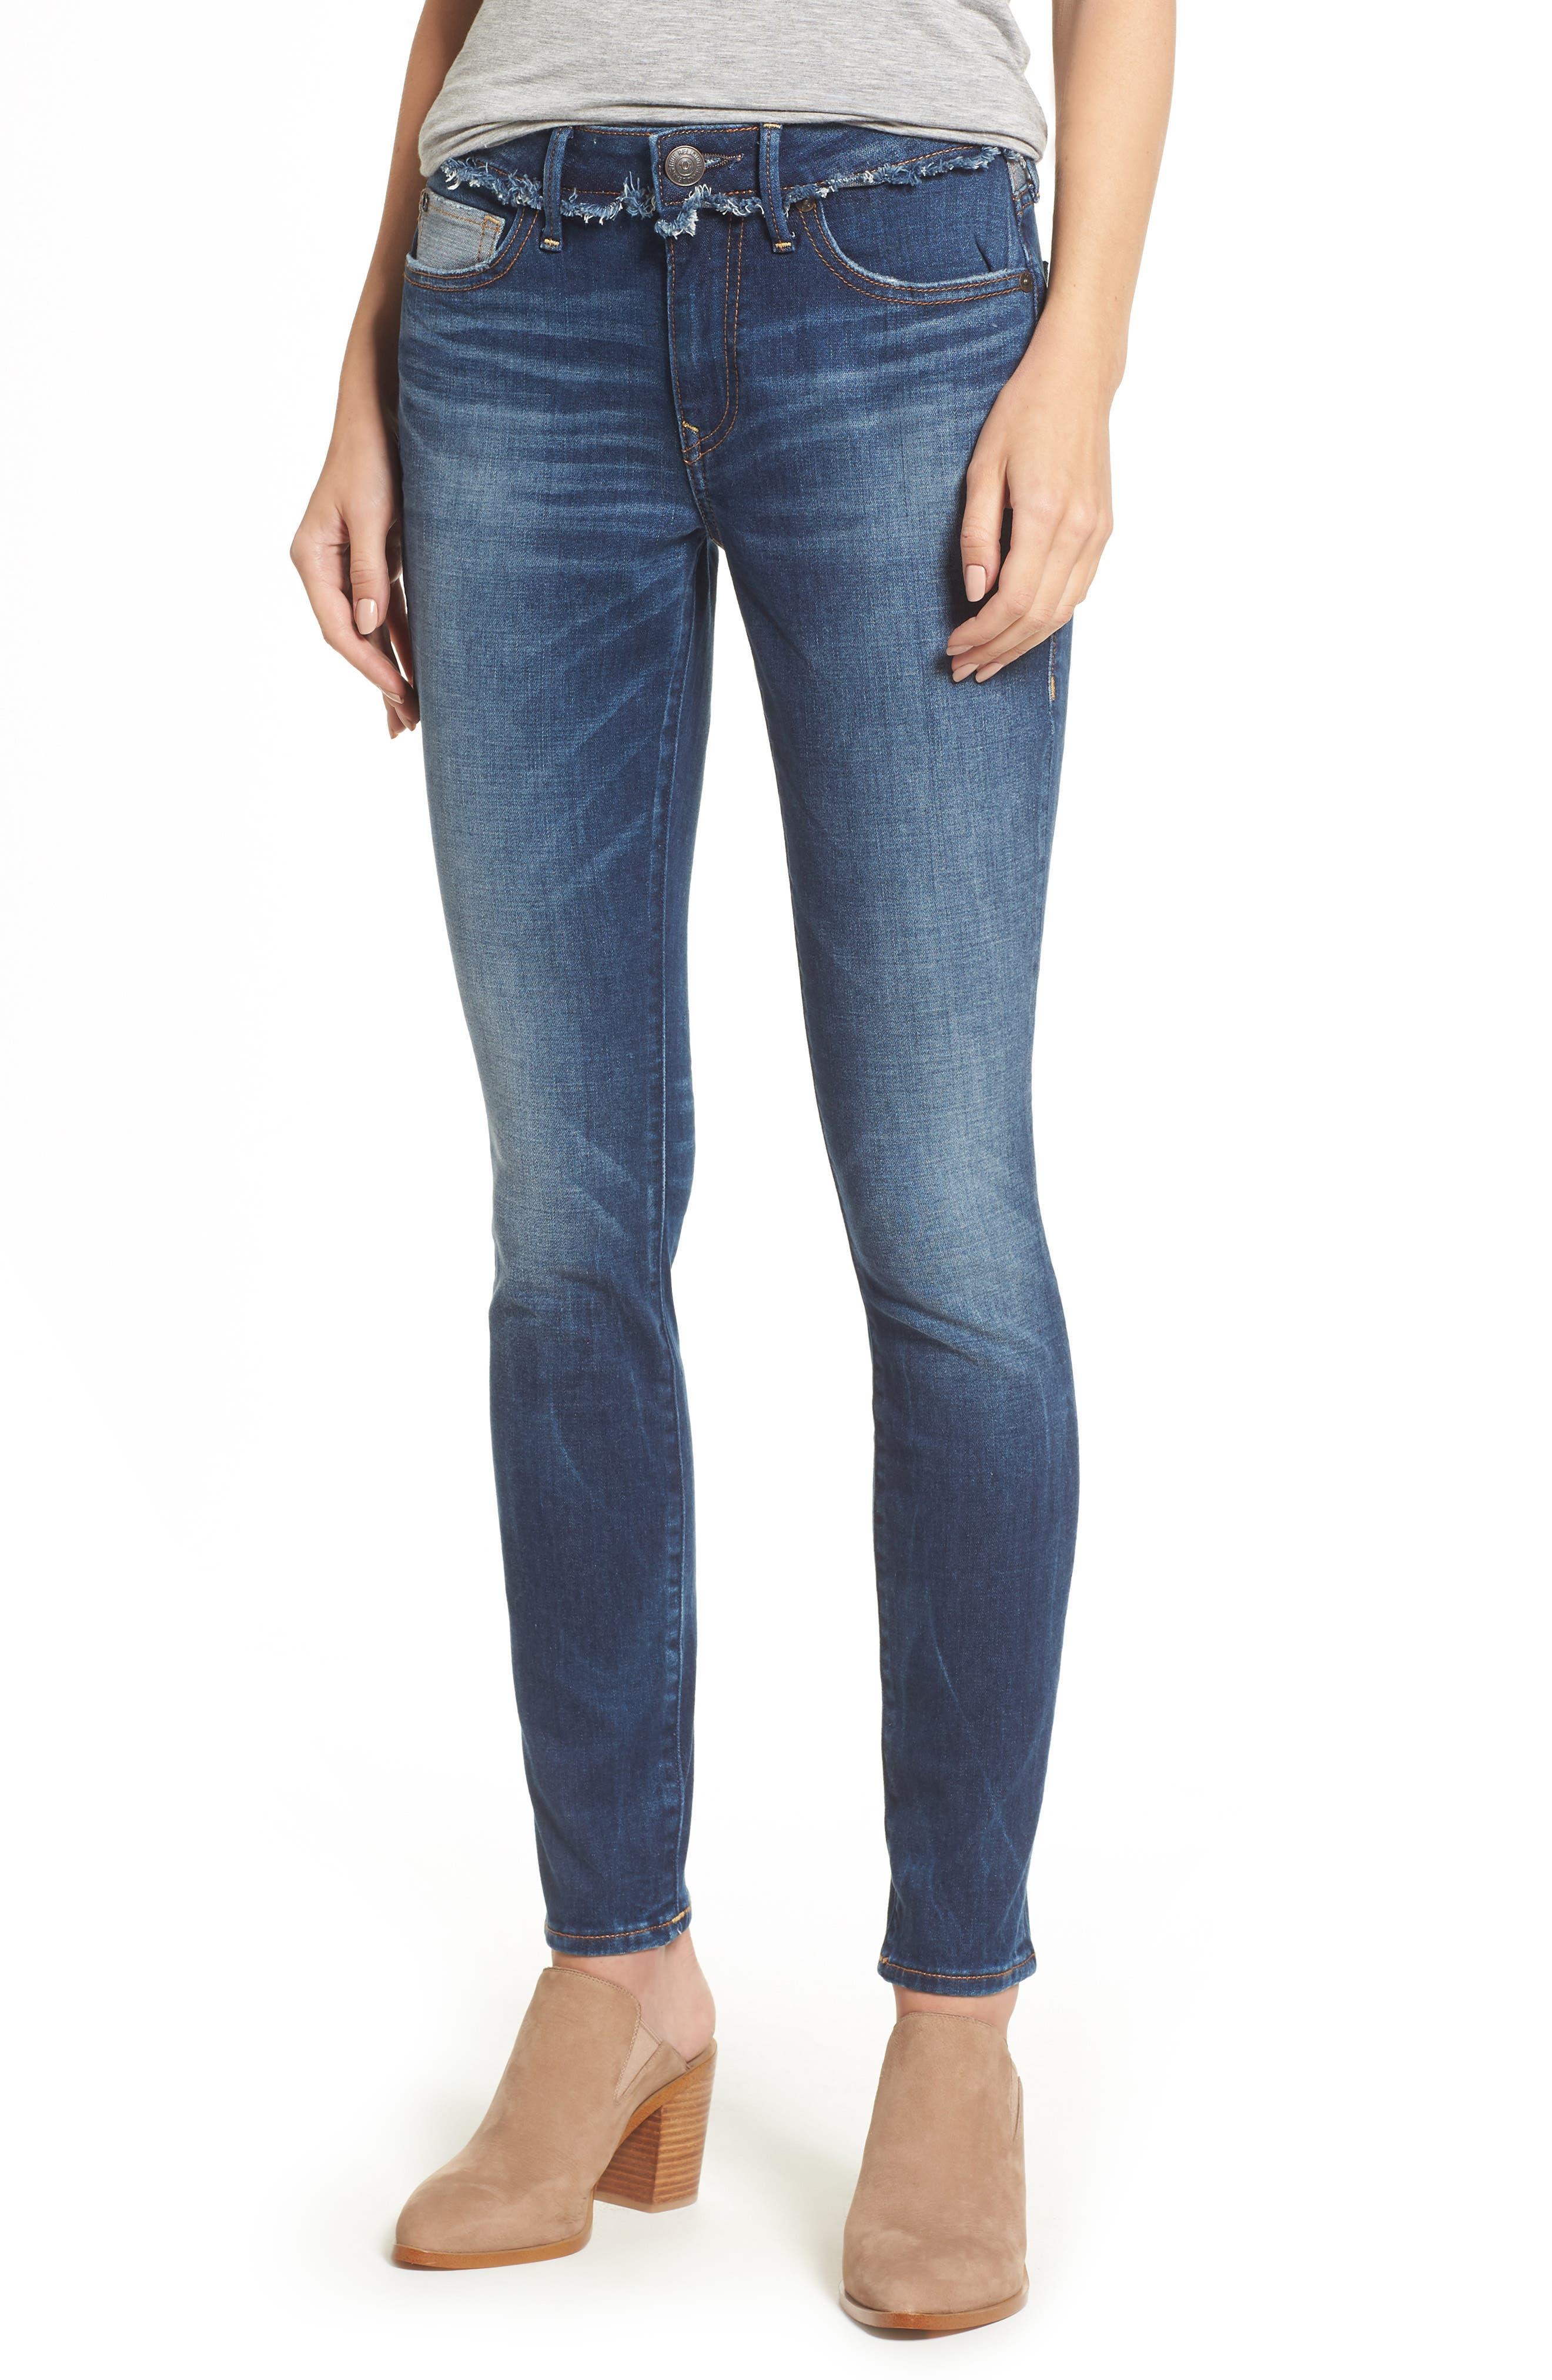 Main Image - True Religion Brand Jeans Jennie Deconstructed Skinny Jeans (Broken Record)